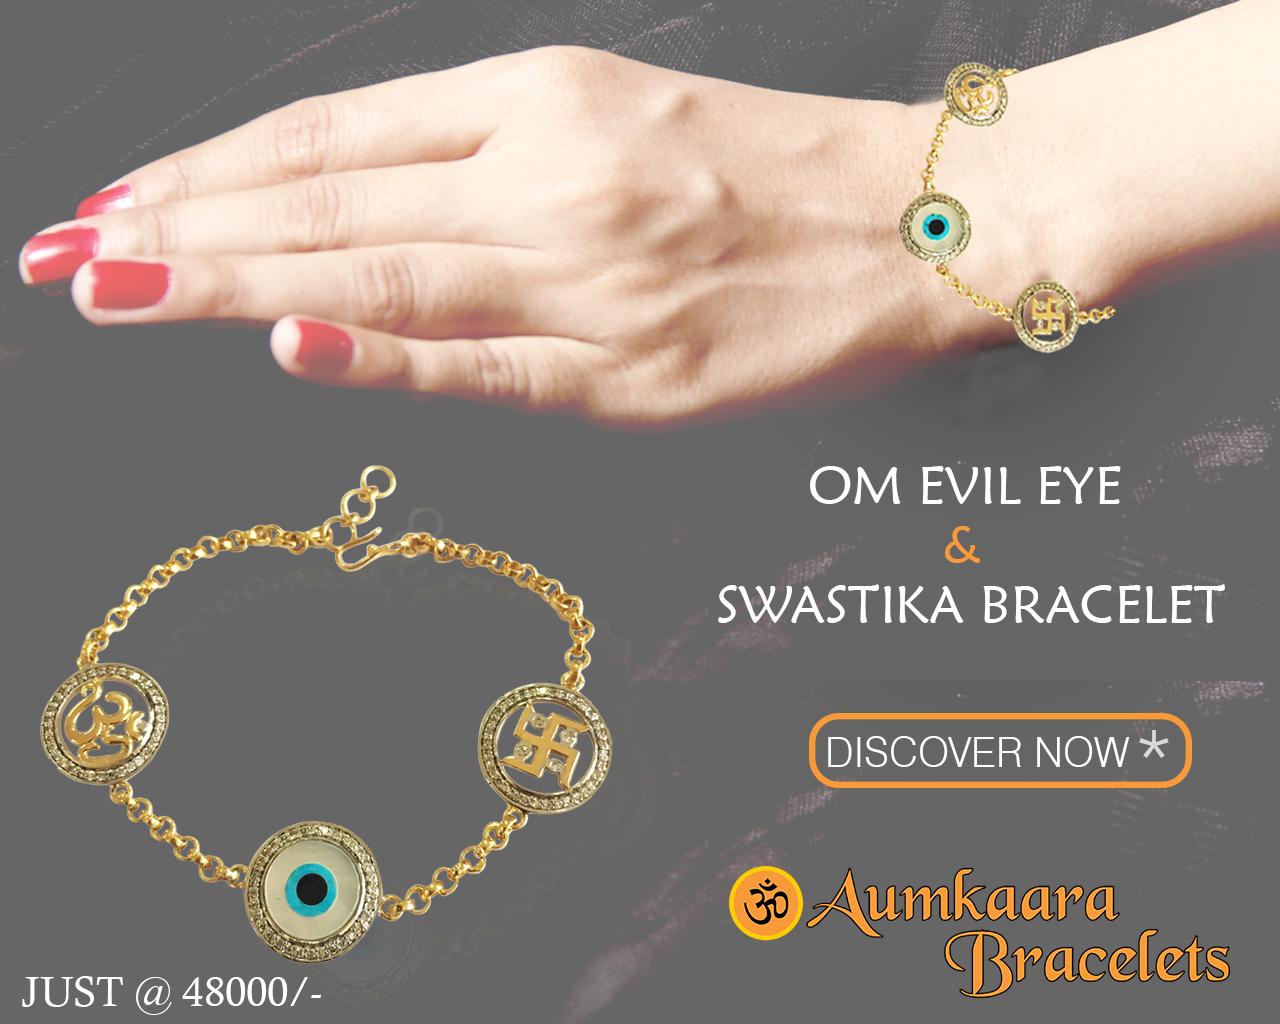 Auspicious Om Evil Eye And Swastika Bracelet In Gold With Diamonds